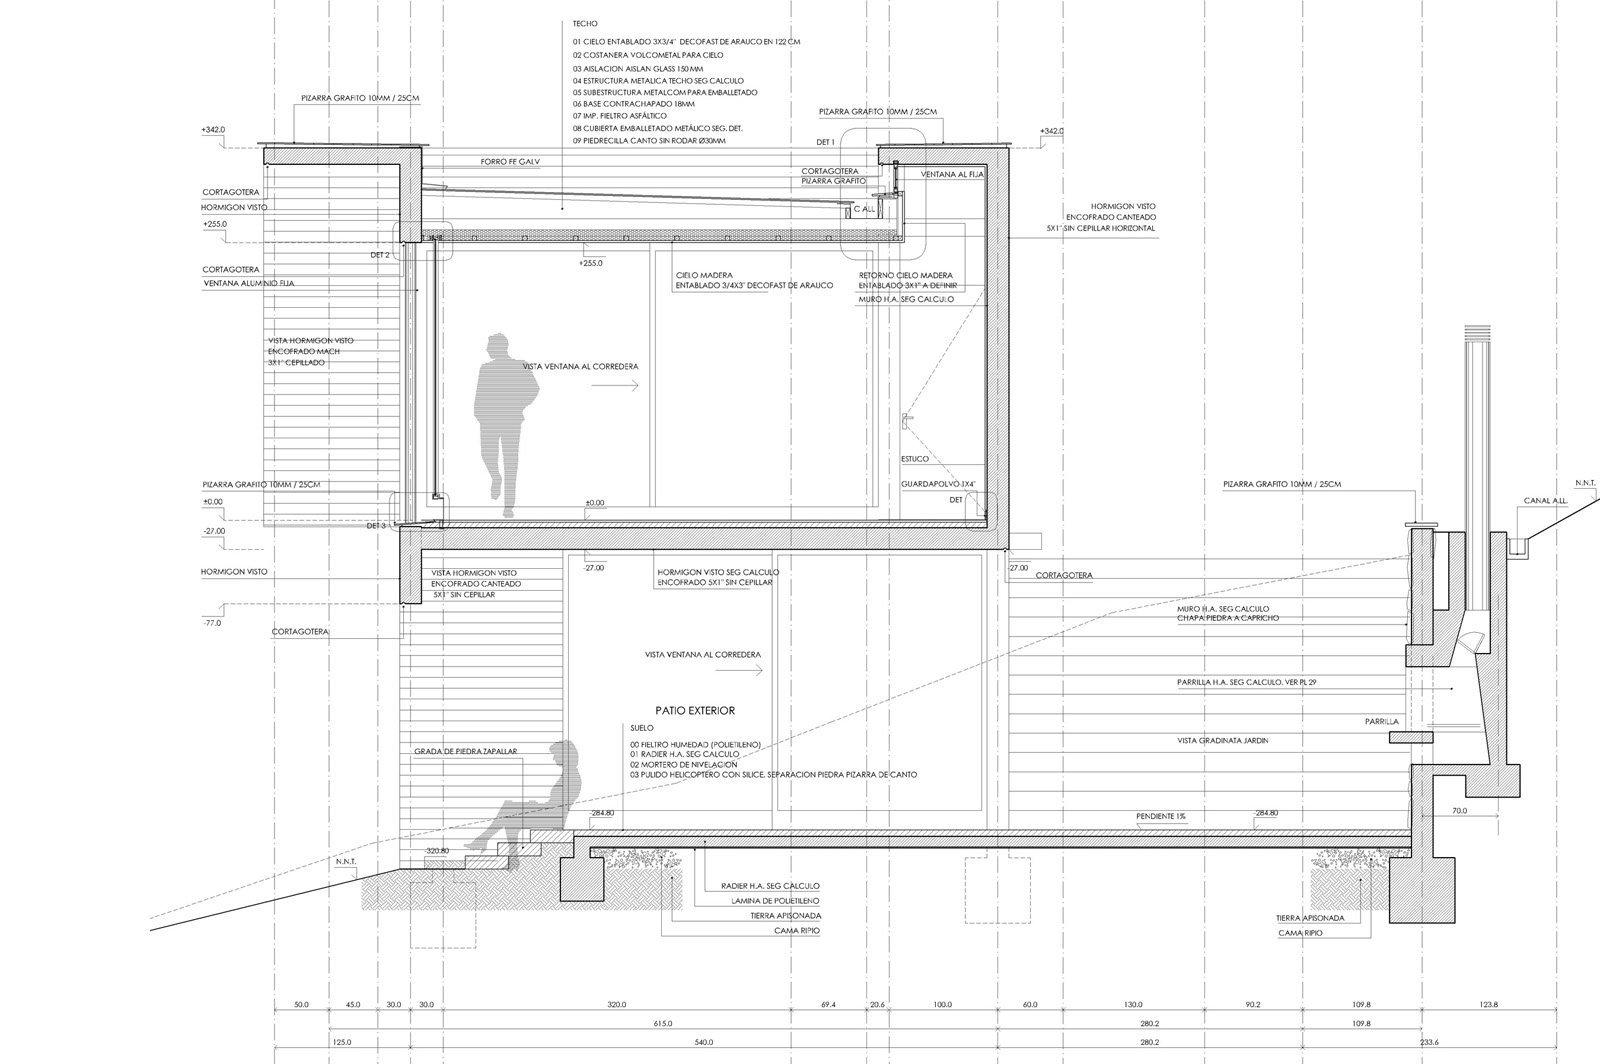 Galer a de en detalle cortes constructivos hormig n 7 - Detalle constructivo techo ...